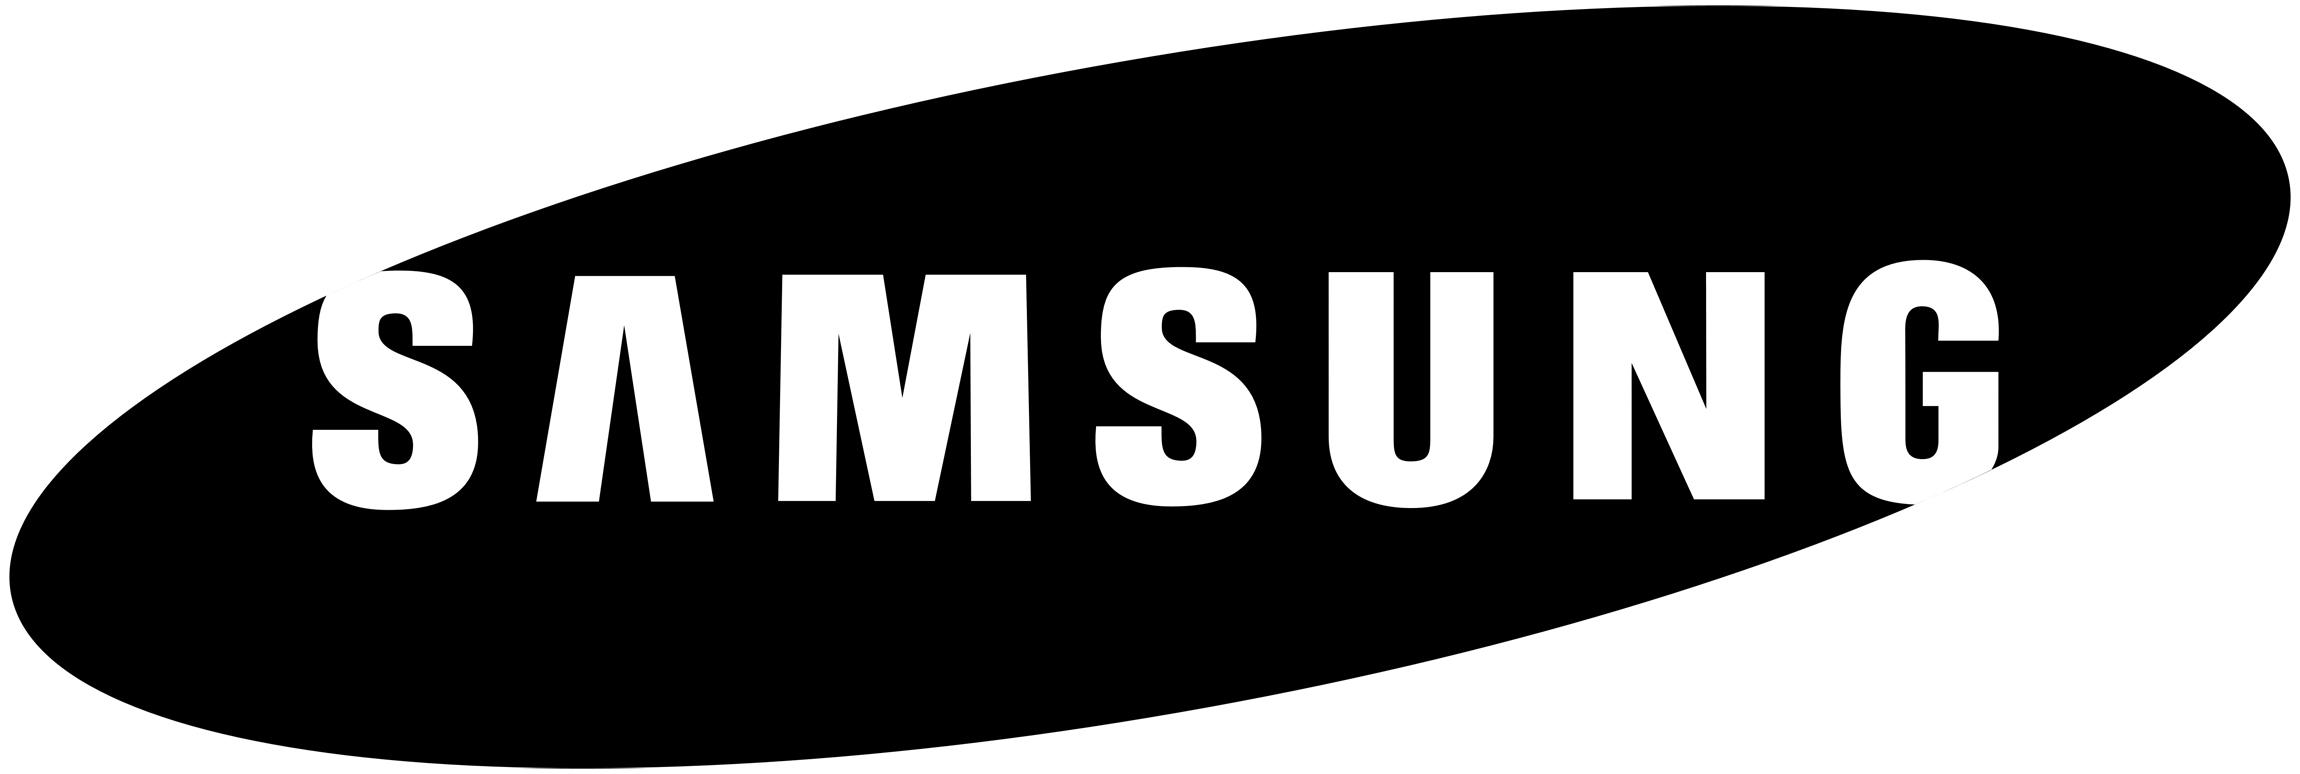 Samsung Logo DXF File